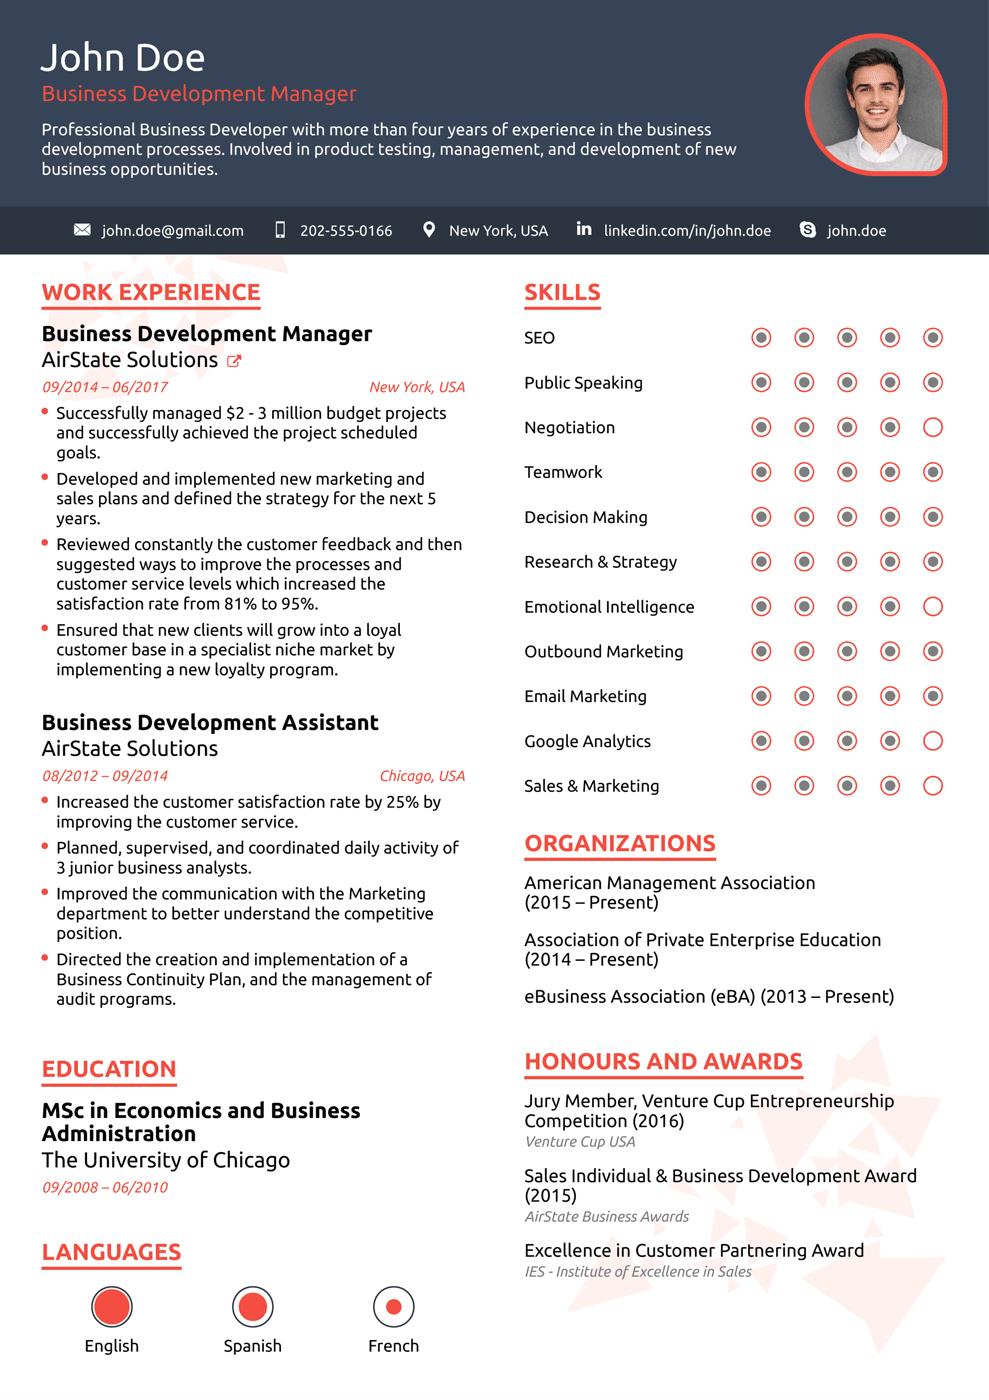 Resume Format In 2018 ResumeFormat Creative resume